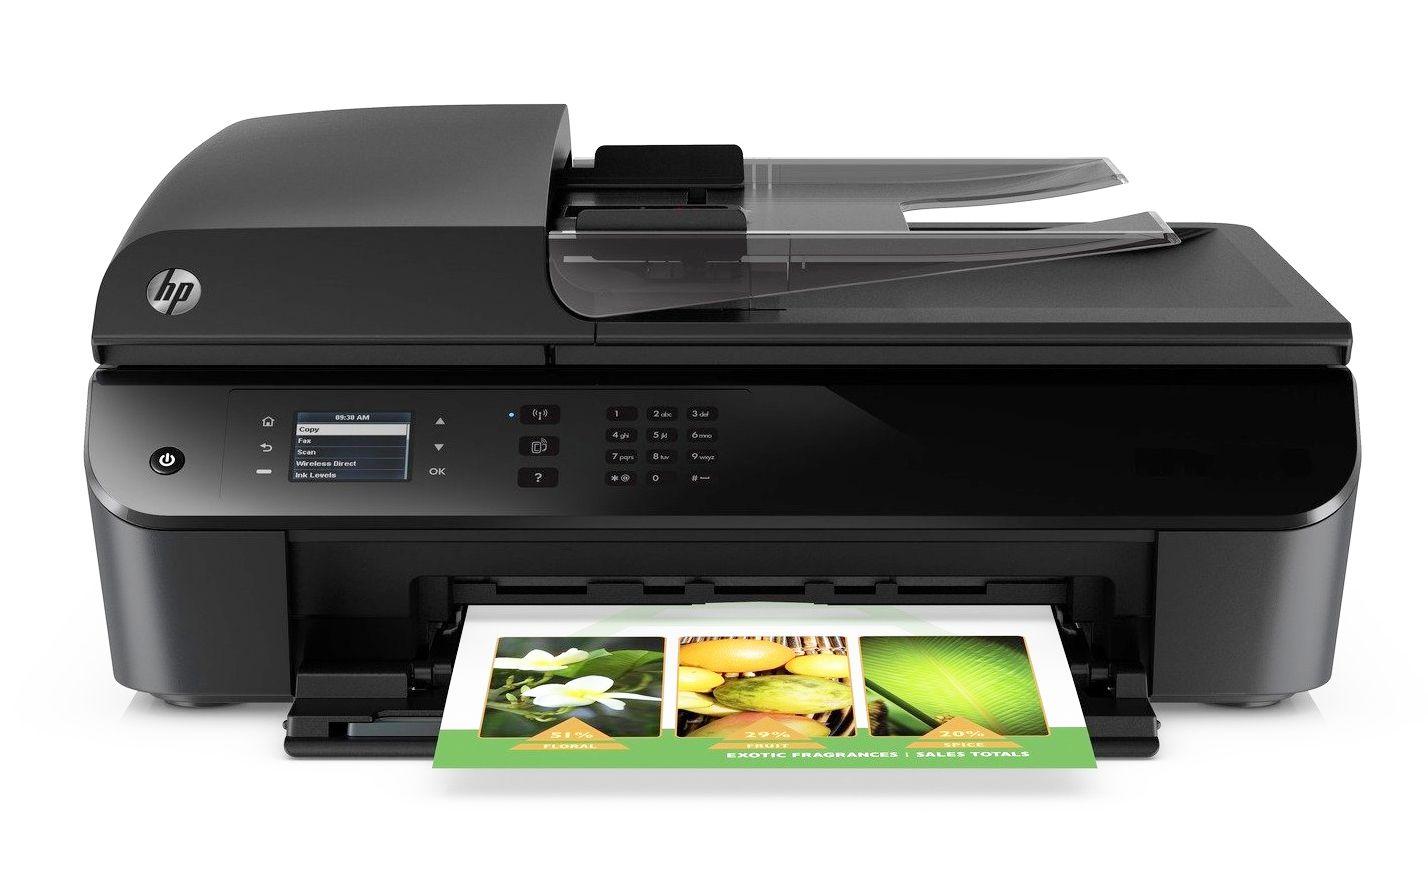 hp 39 s officejet 4650 all in one printer. Black Bedroom Furniture Sets. Home Design Ideas